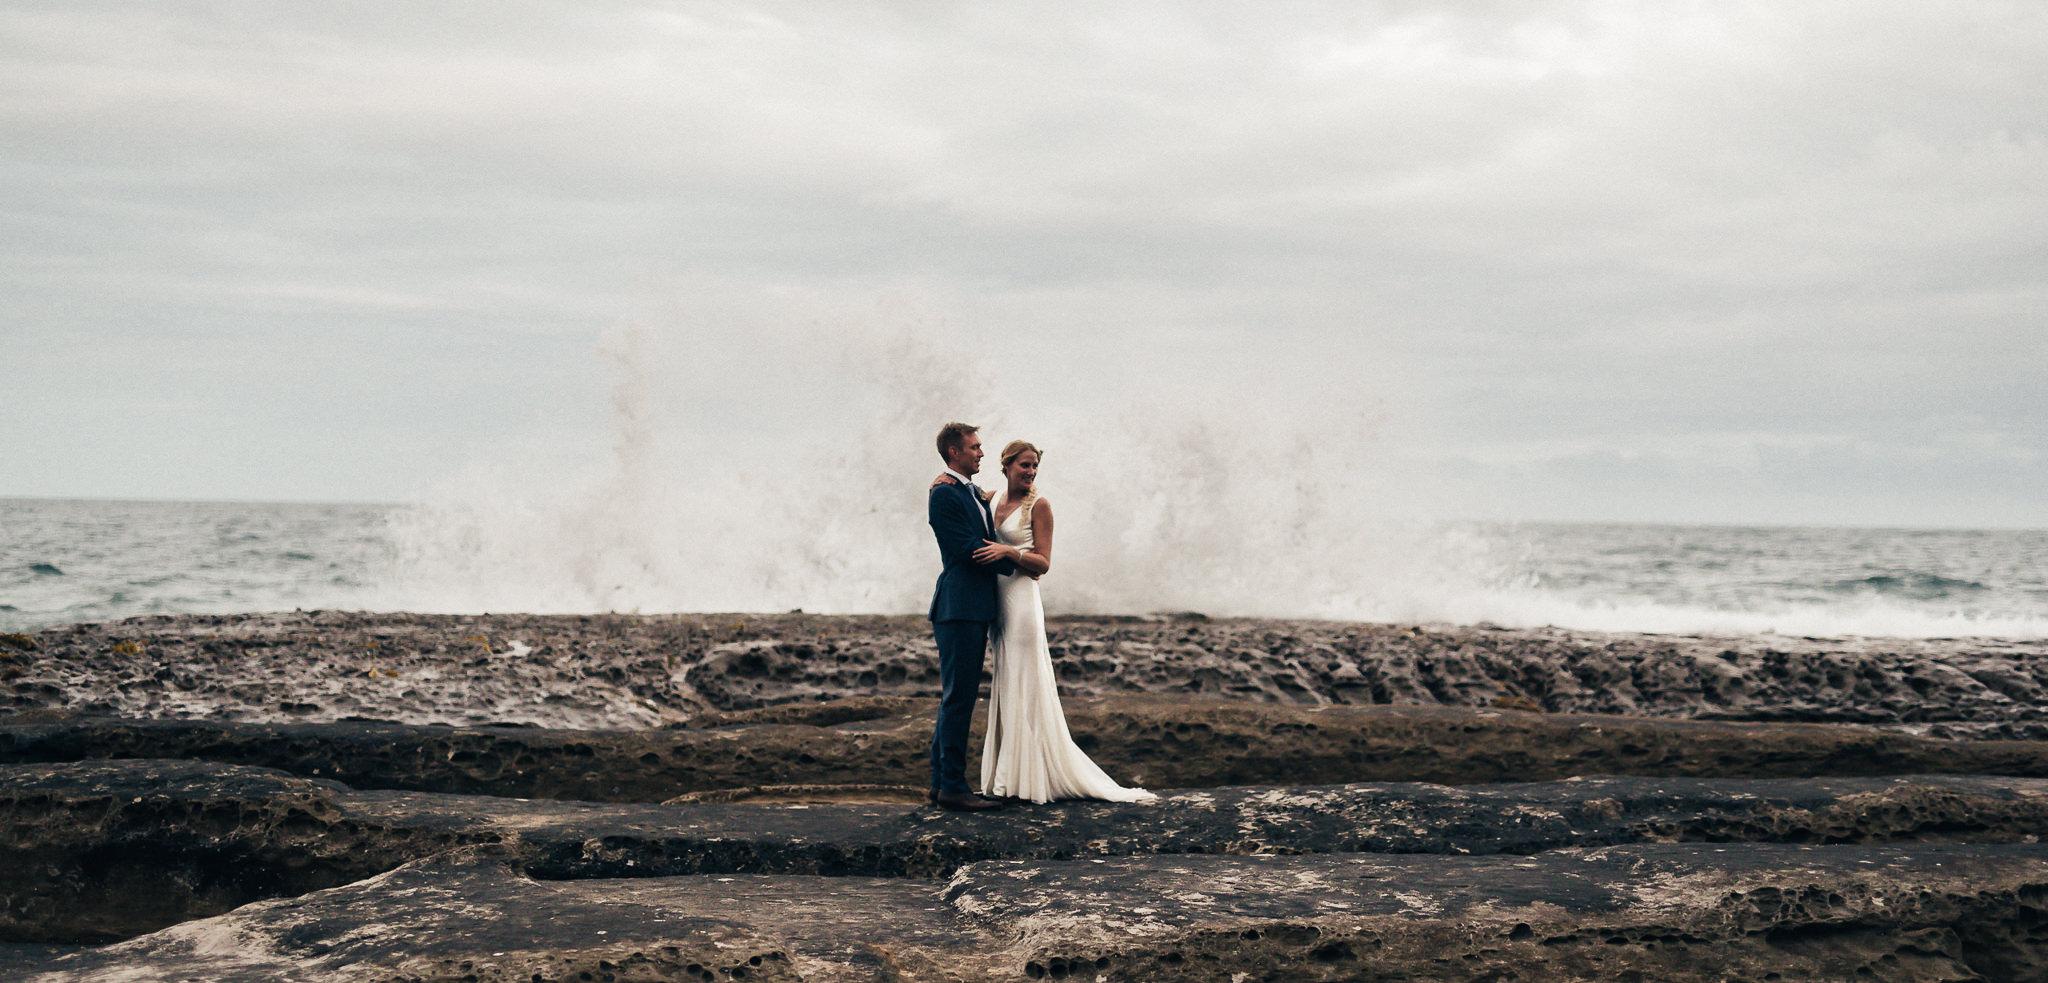 Sydney Wedding Photographer (131 of 182).jpg